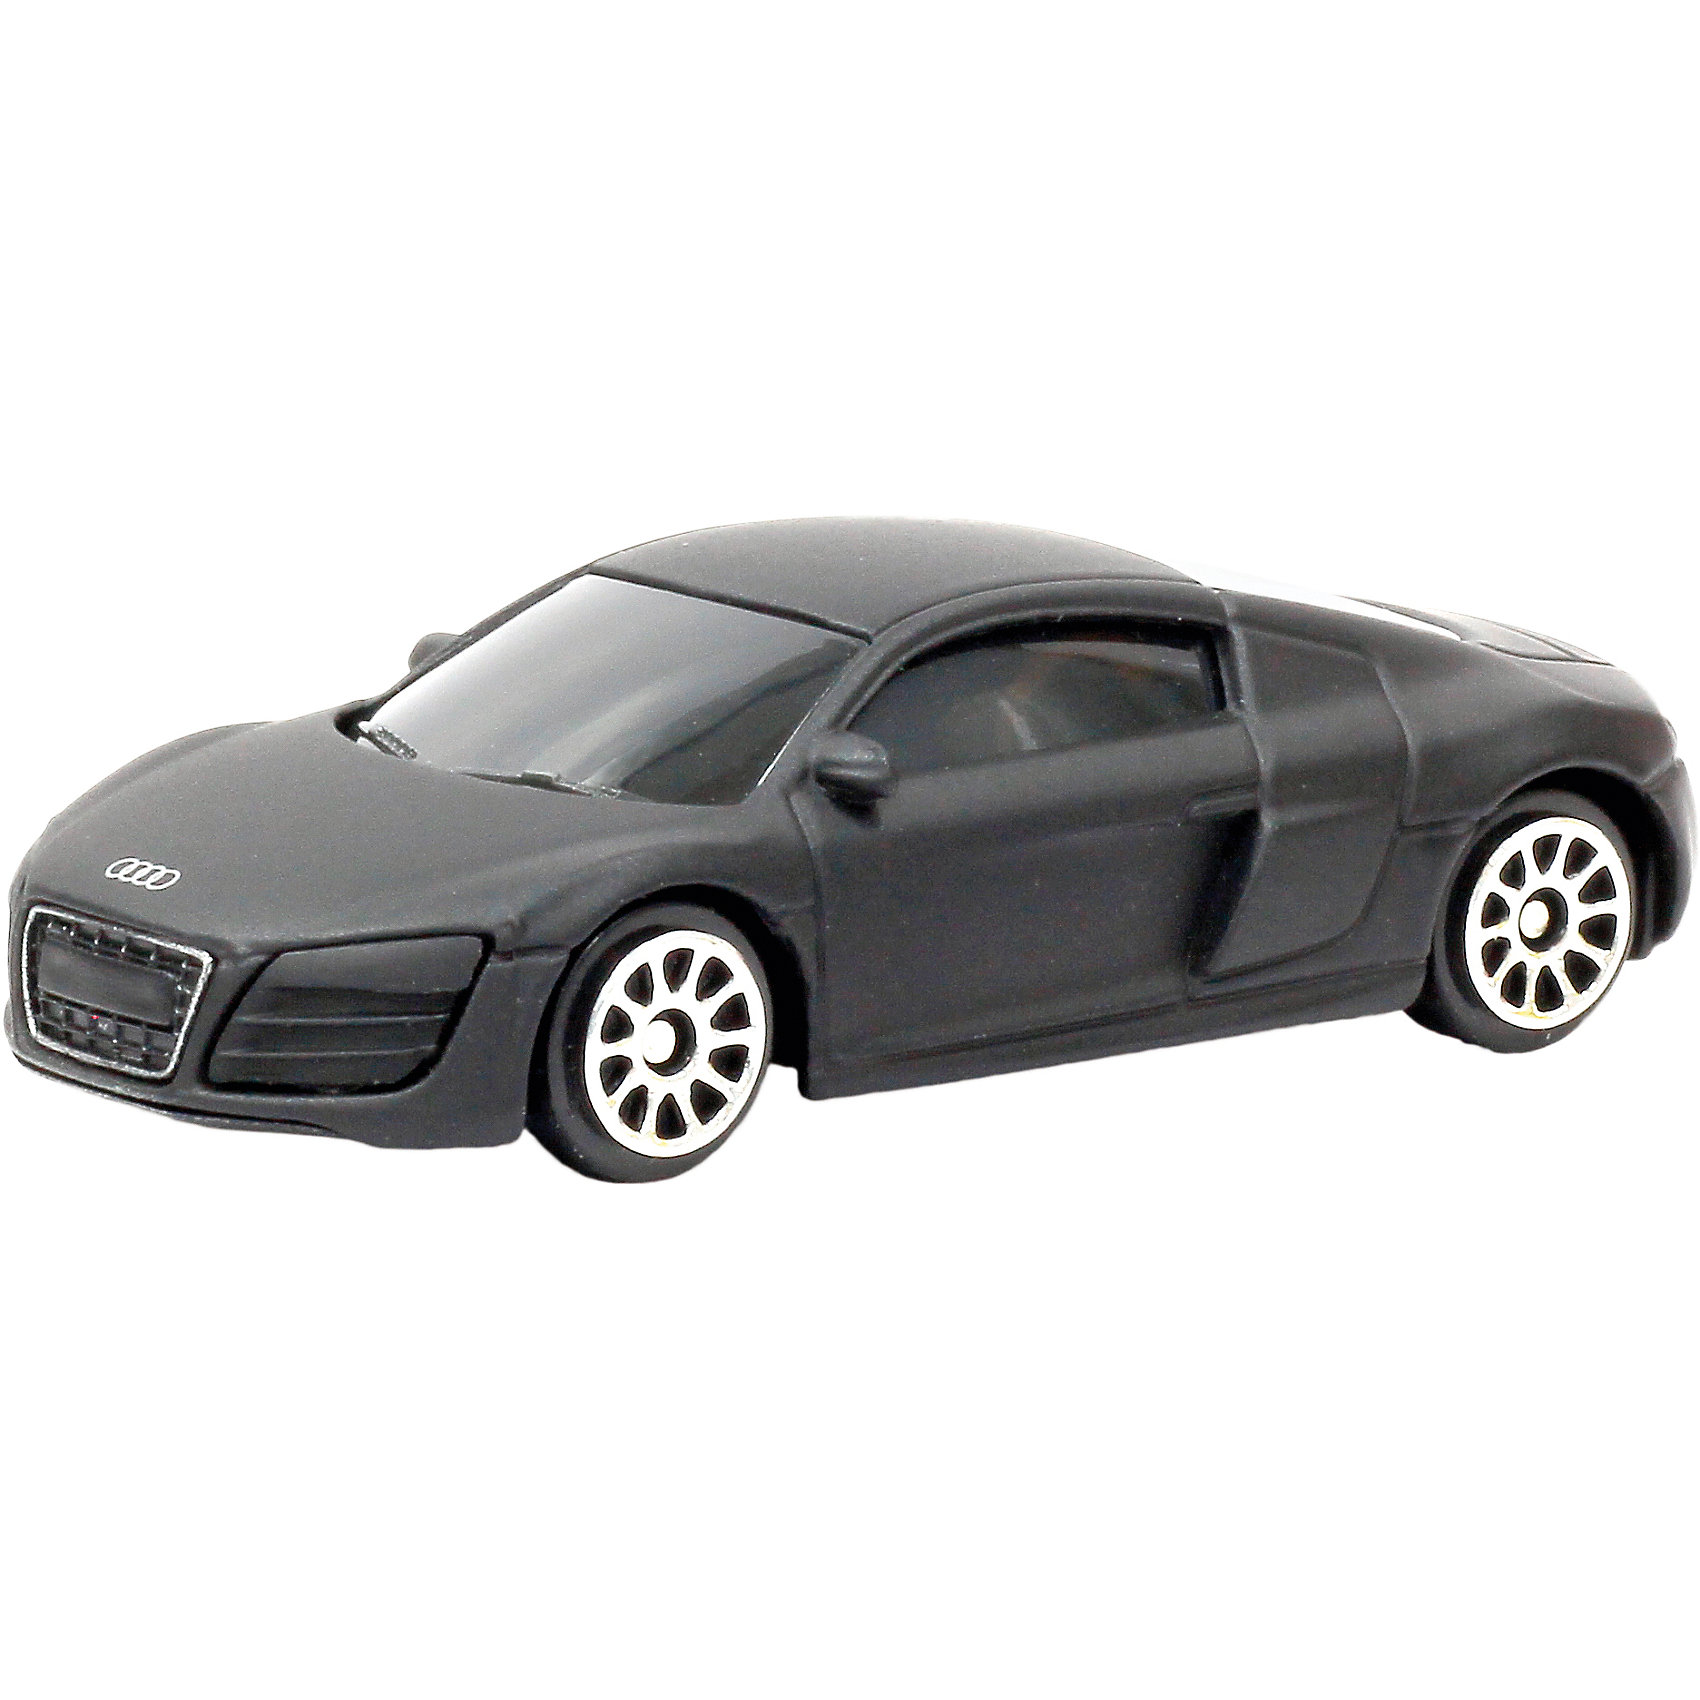 Машинка Audi R8 V10 Black Edition 3, AutotimeМашинки<br><br><br>Ширина мм: 165<br>Глубина мм: 57<br>Высота мм: 75<br>Вес г: 15<br>Возраст от месяцев: 36<br>Возраст до месяцев: 2147483647<br>Пол: Мужской<br>Возраст: Детский<br>SKU: 5584113